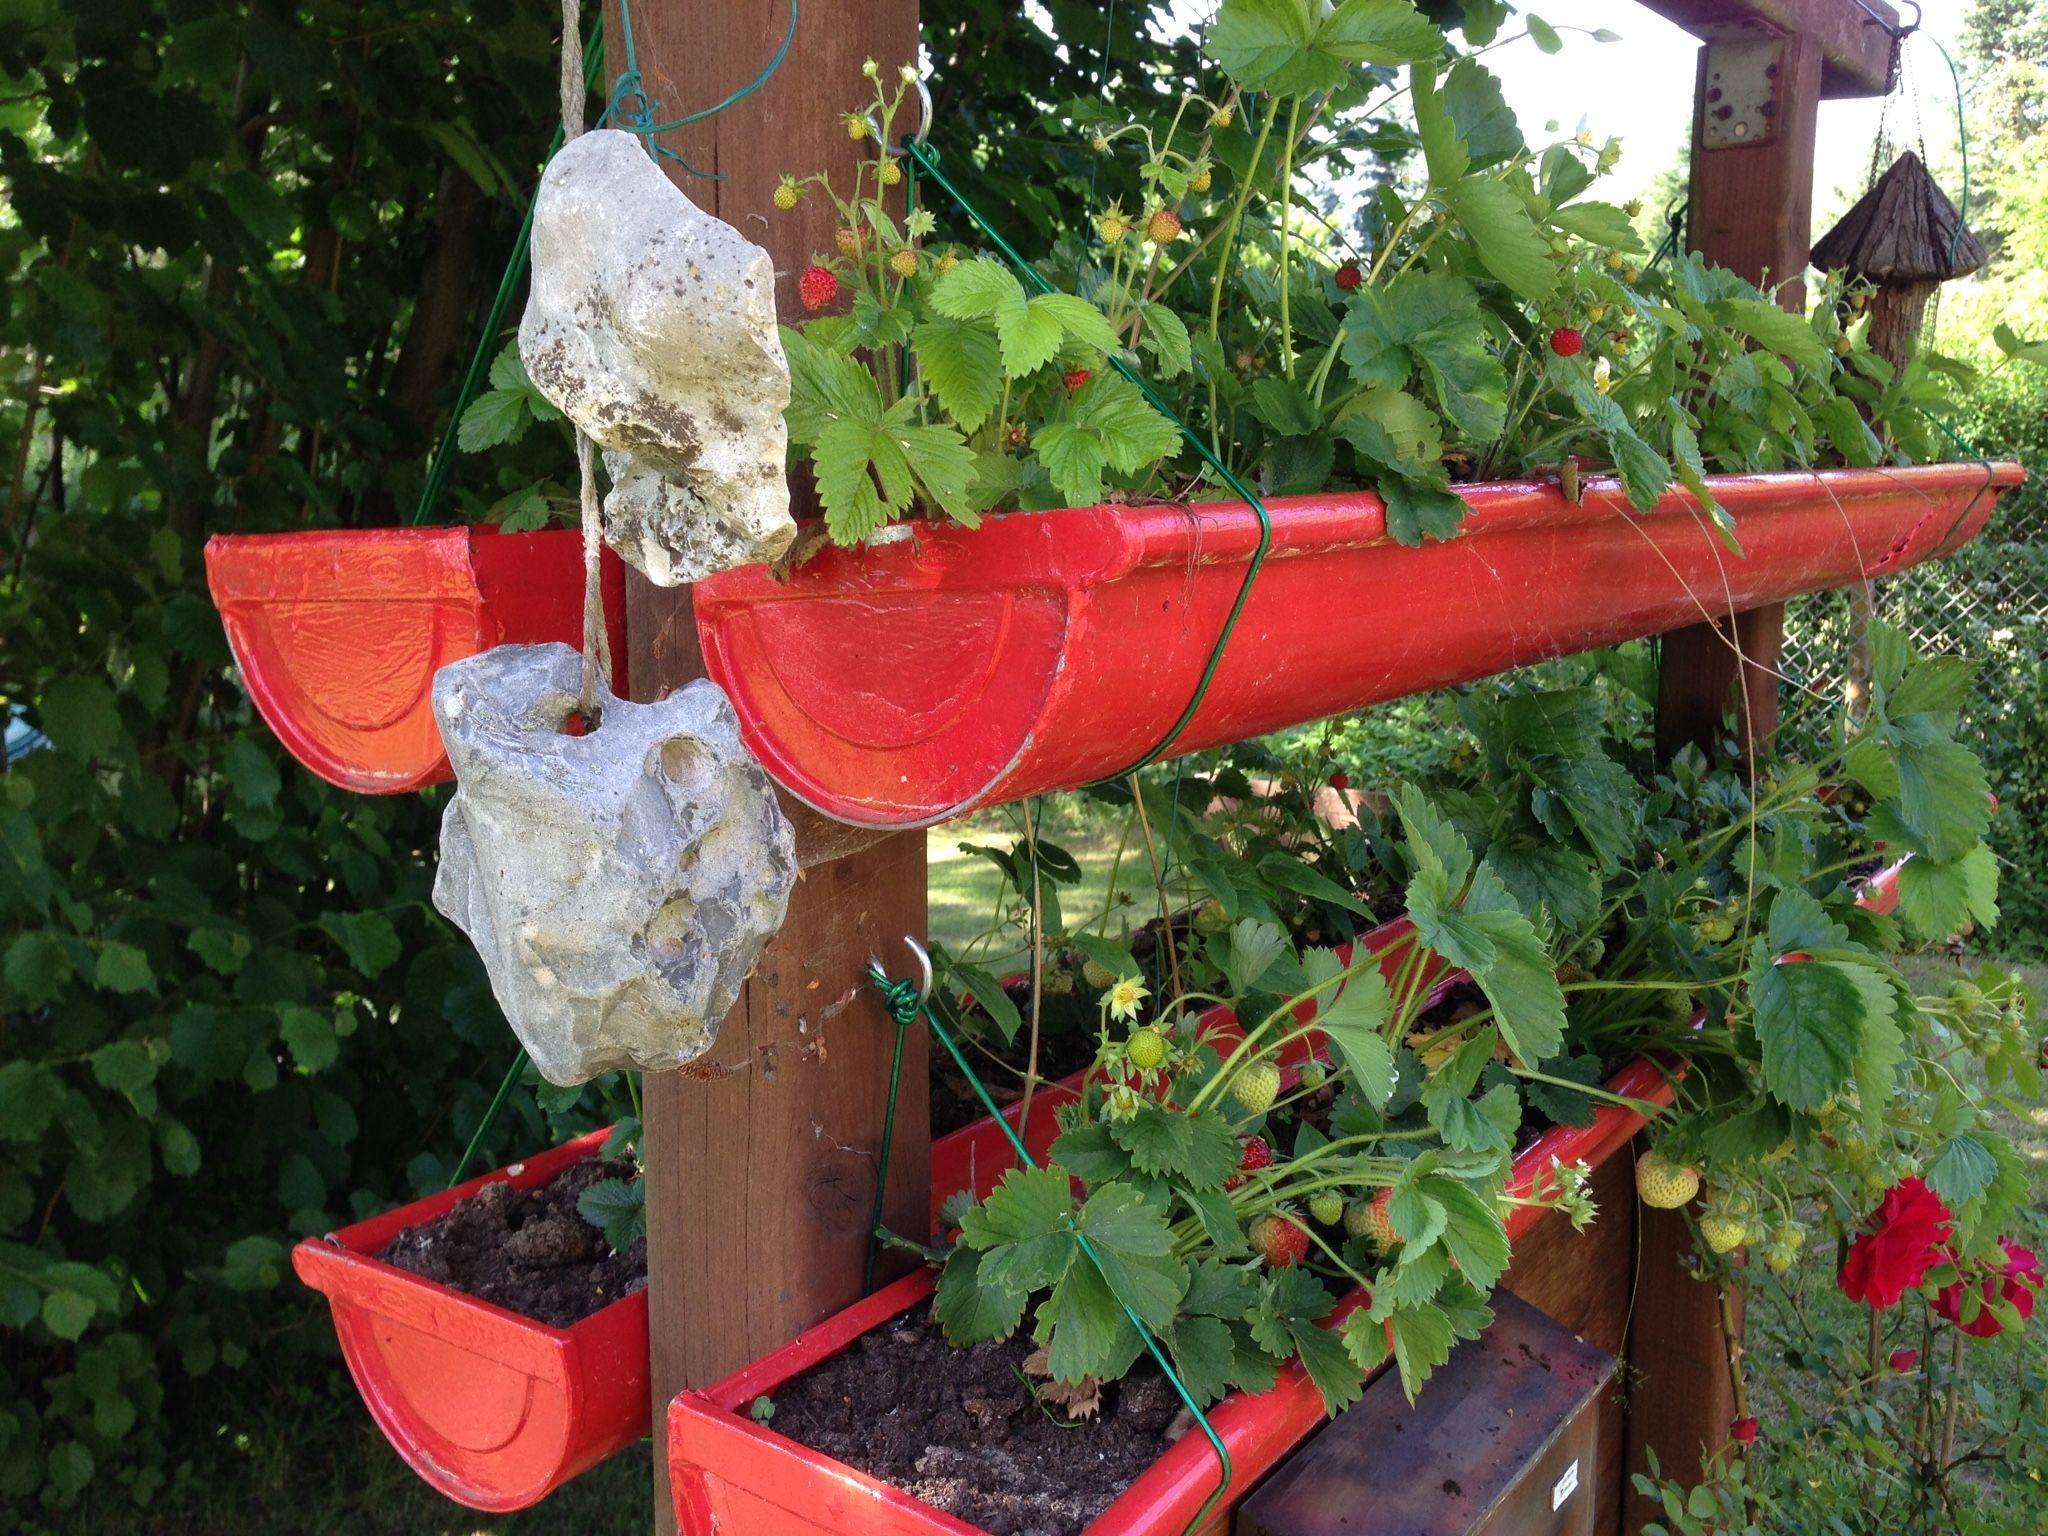 Rain gutter for growing strawberries #raingutterplanters #planters